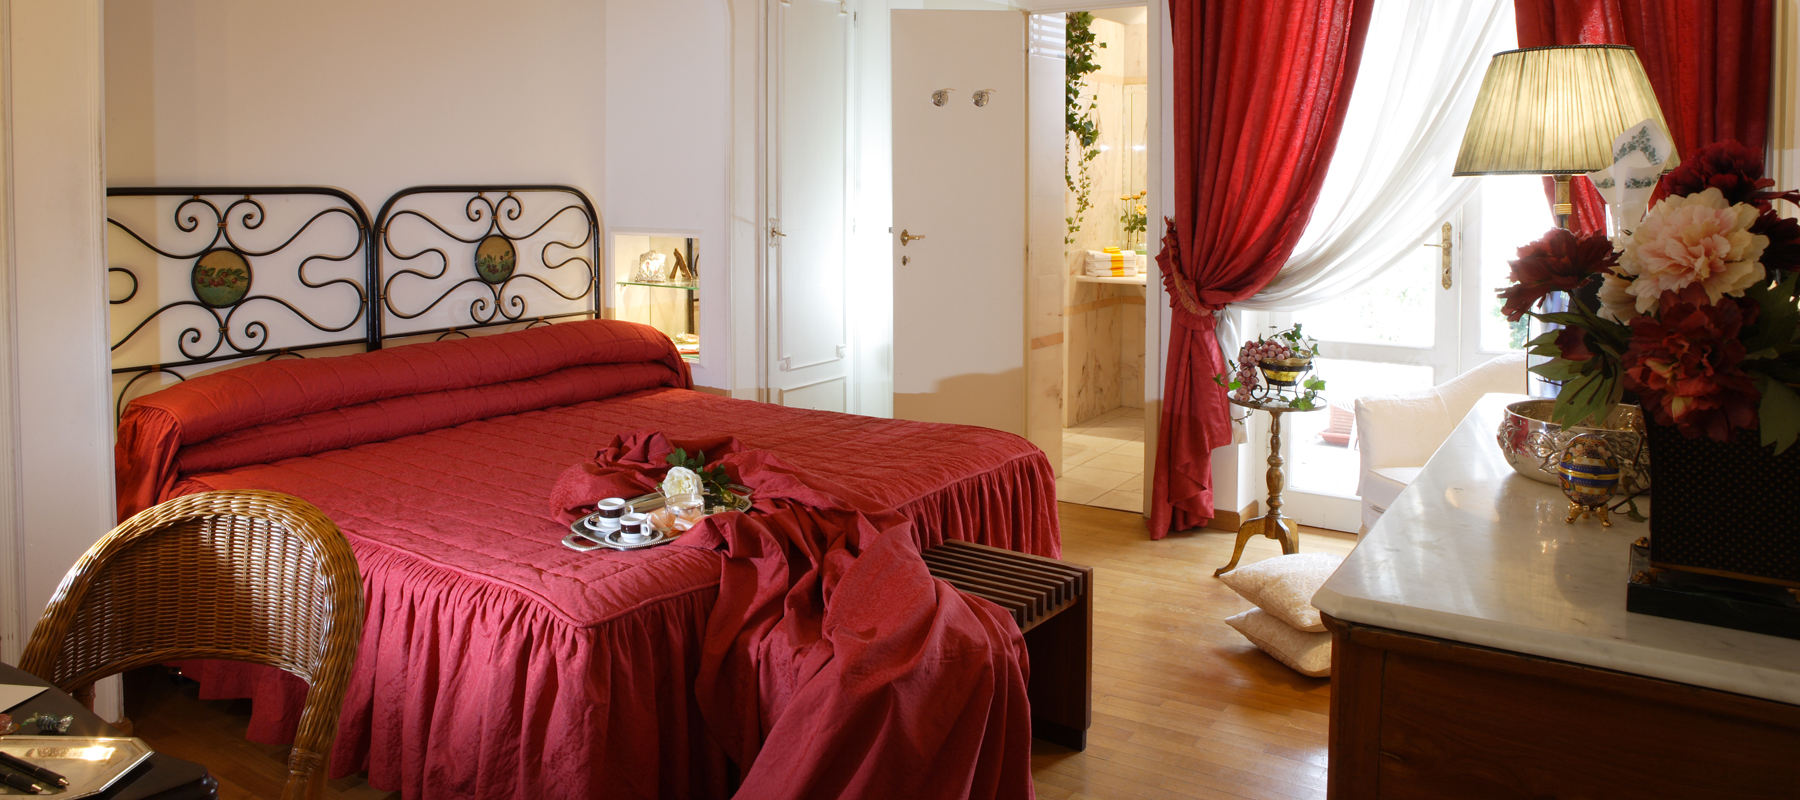 Hotel San Marco Siena Spa